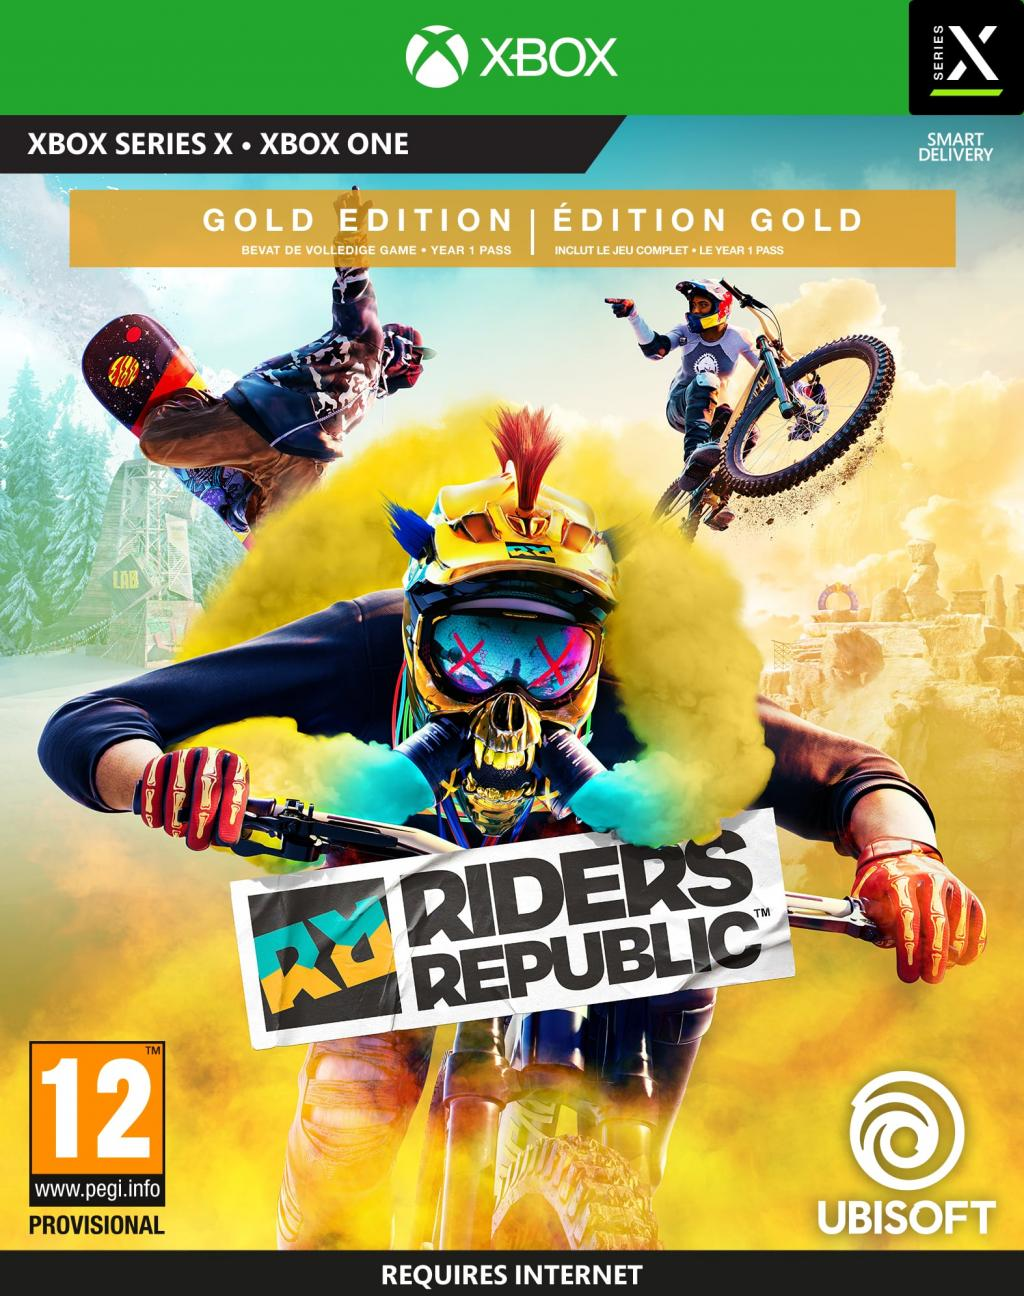 Riders Republic GOLD - XB ONE / SERIES X_1